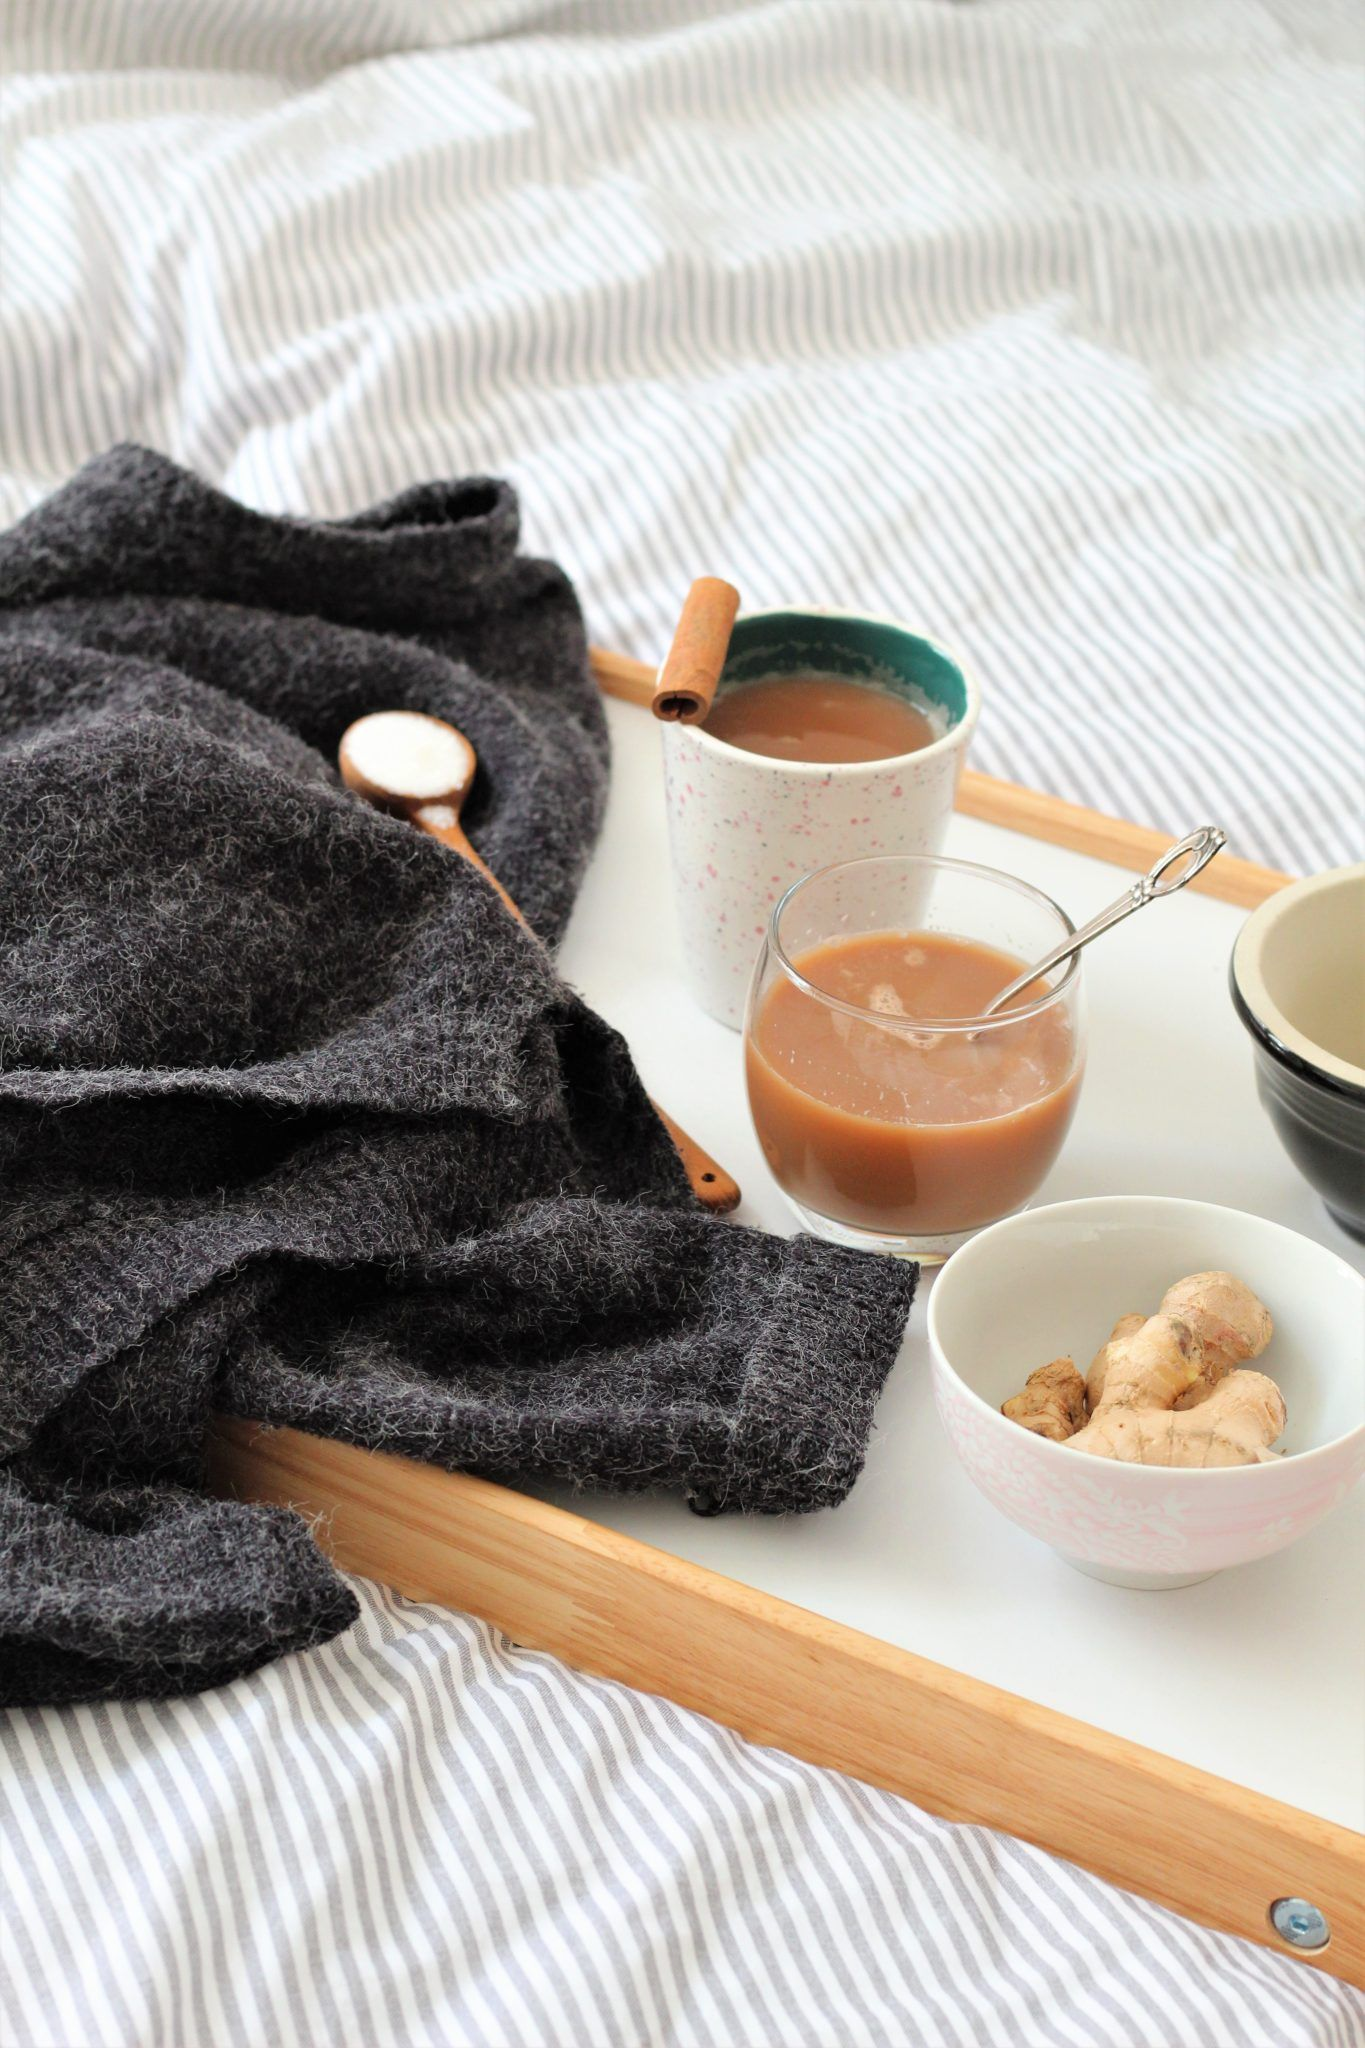 Hjemmelavet chai med havremælk - verdens hyggeligste drik